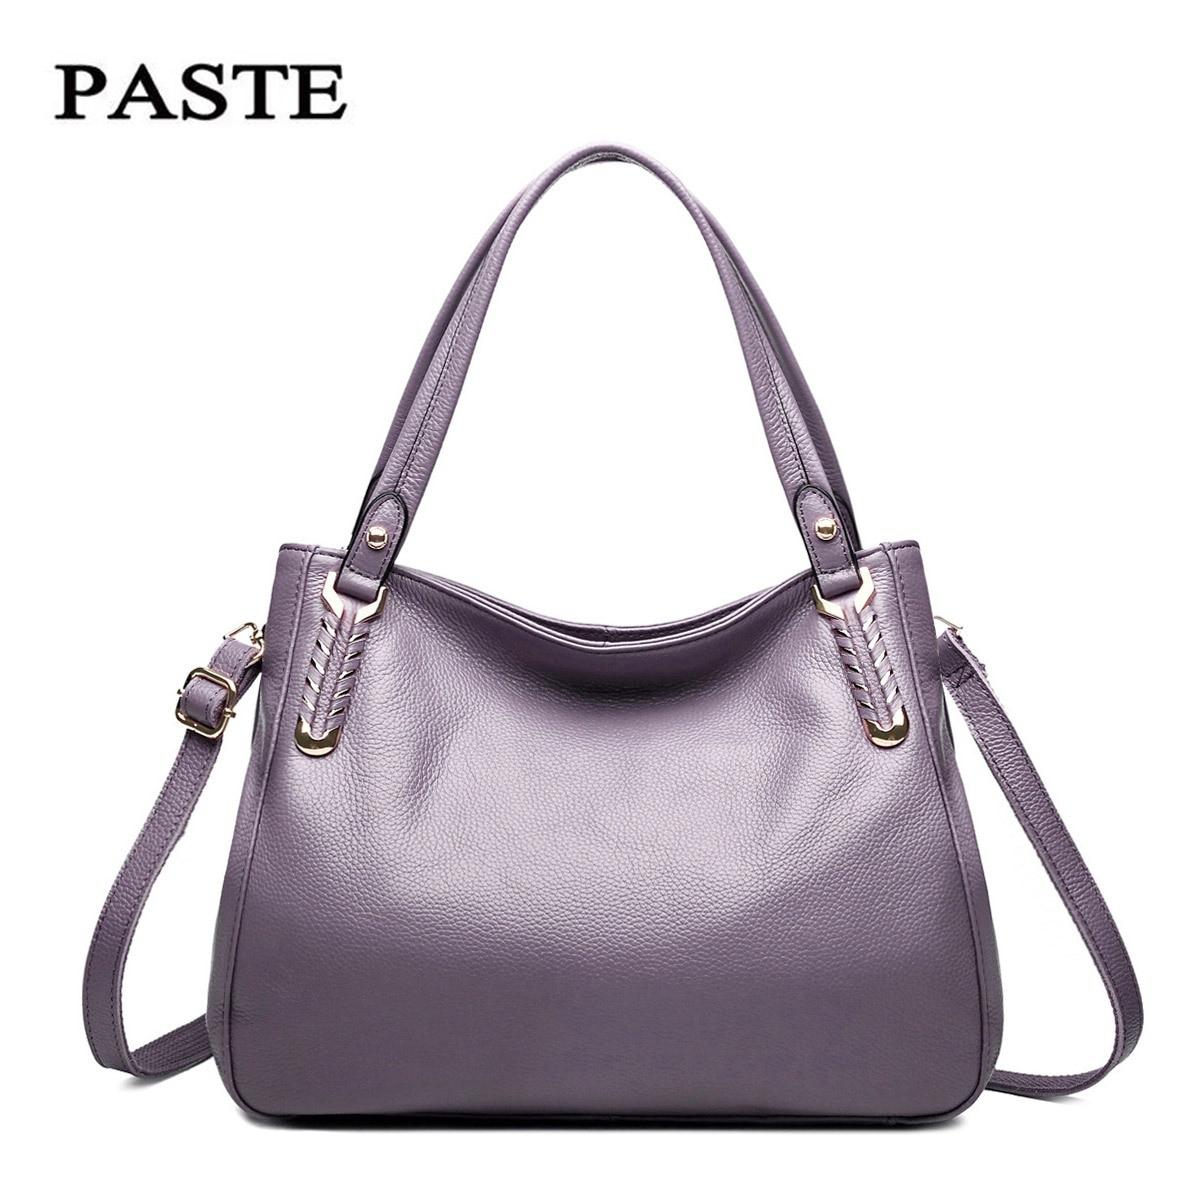 Simple Brand Designer Style Women Leather Handbag Genuine Leather Bag Classical Hobos Shoulder Bag Hand Bags Sac A Main Borse